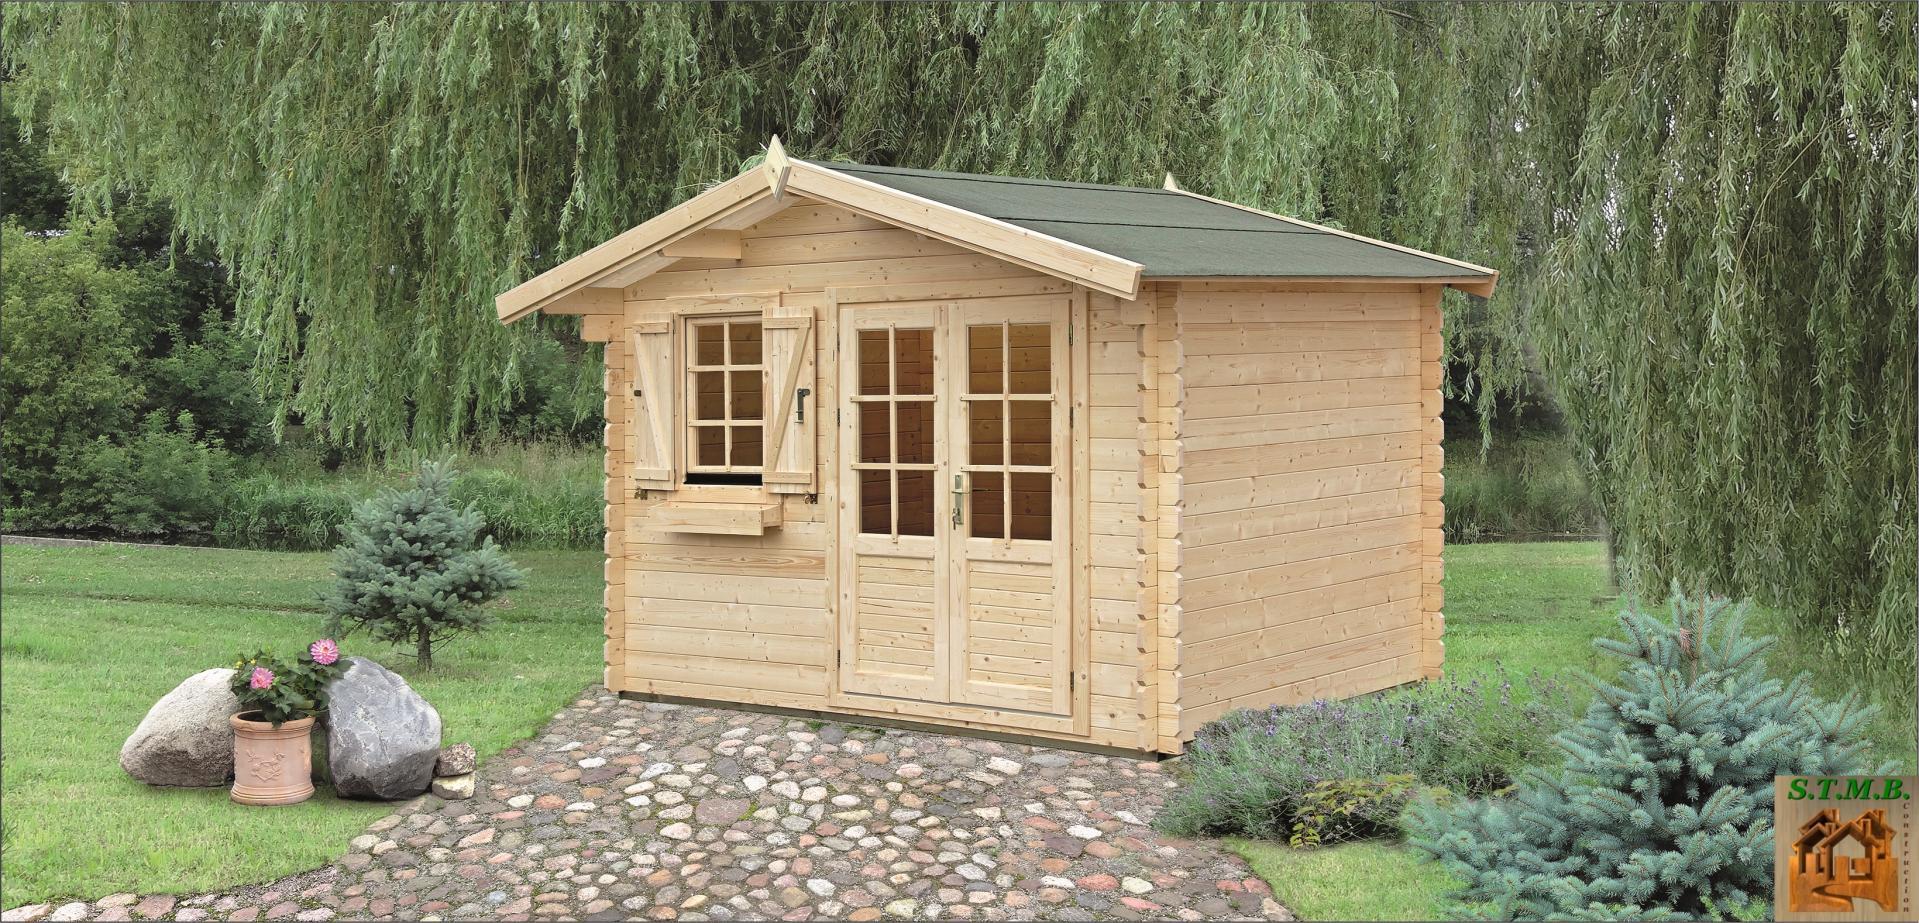 chalet de jardin bois mod le prunes m vendu en kit. Black Bedroom Furniture Sets. Home Design Ideas